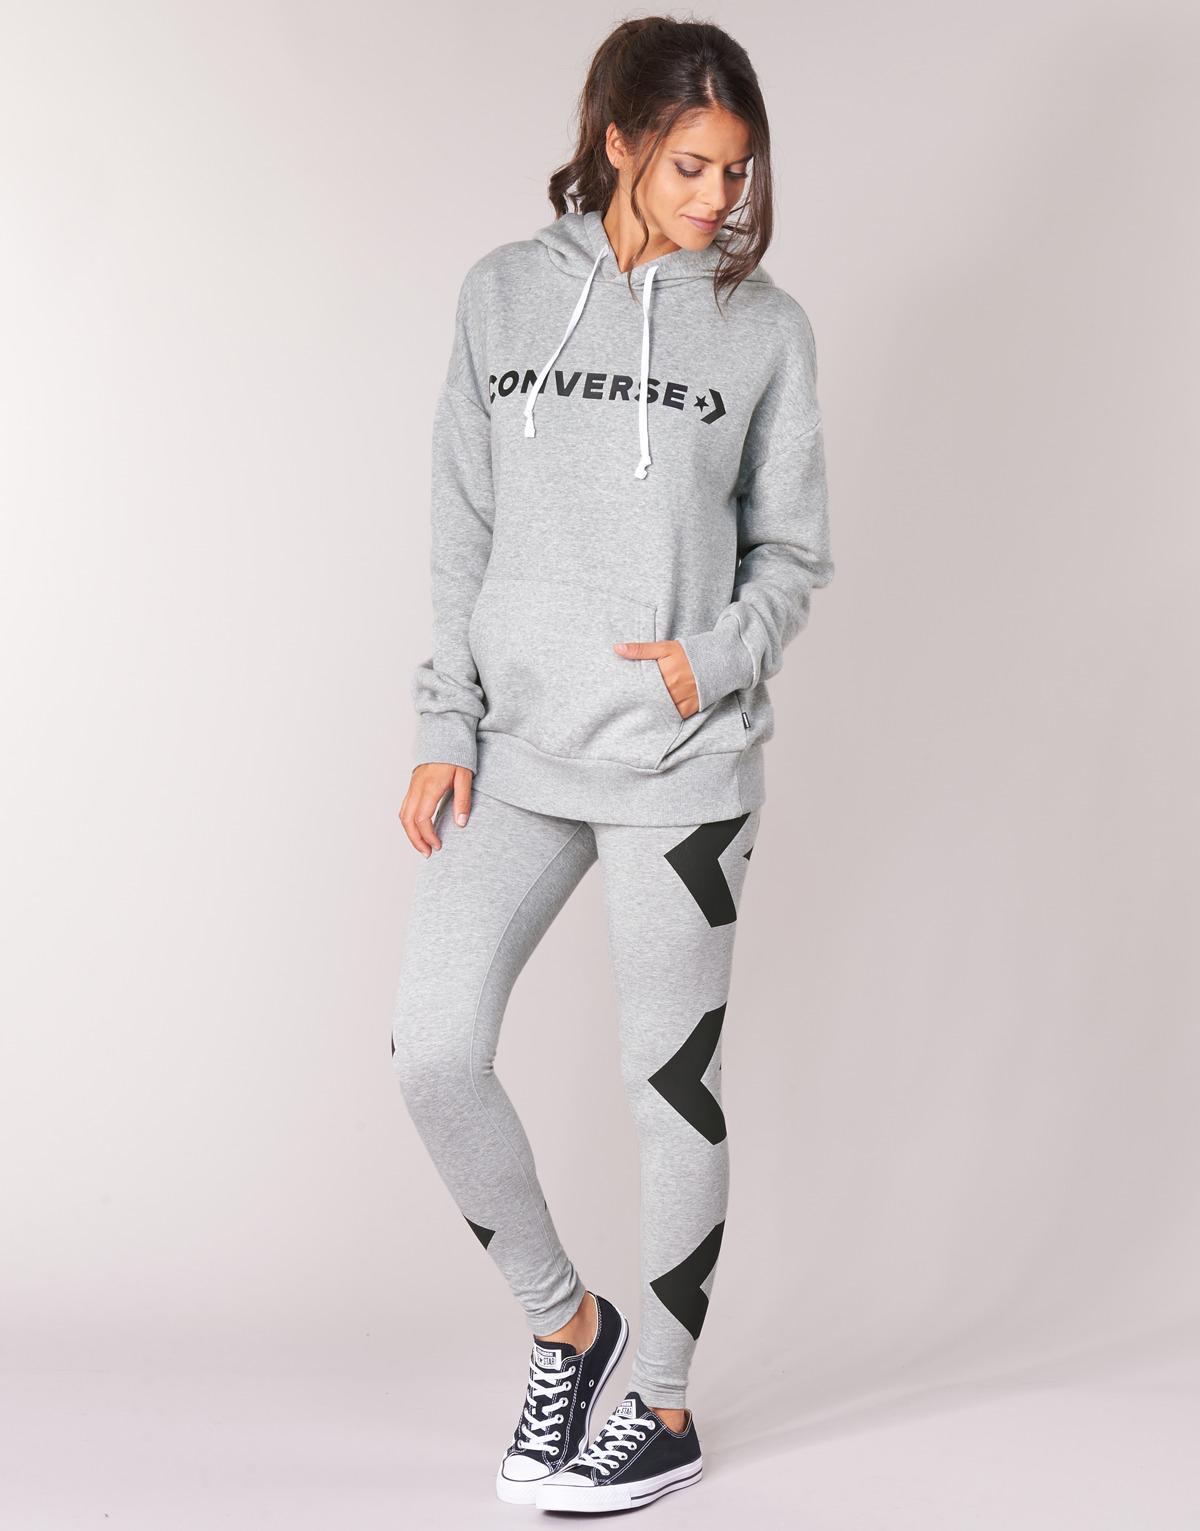 a936eddc6838 Converse Star Chevron Oversized Pullover Hoodie Women s Sweatshirt ...